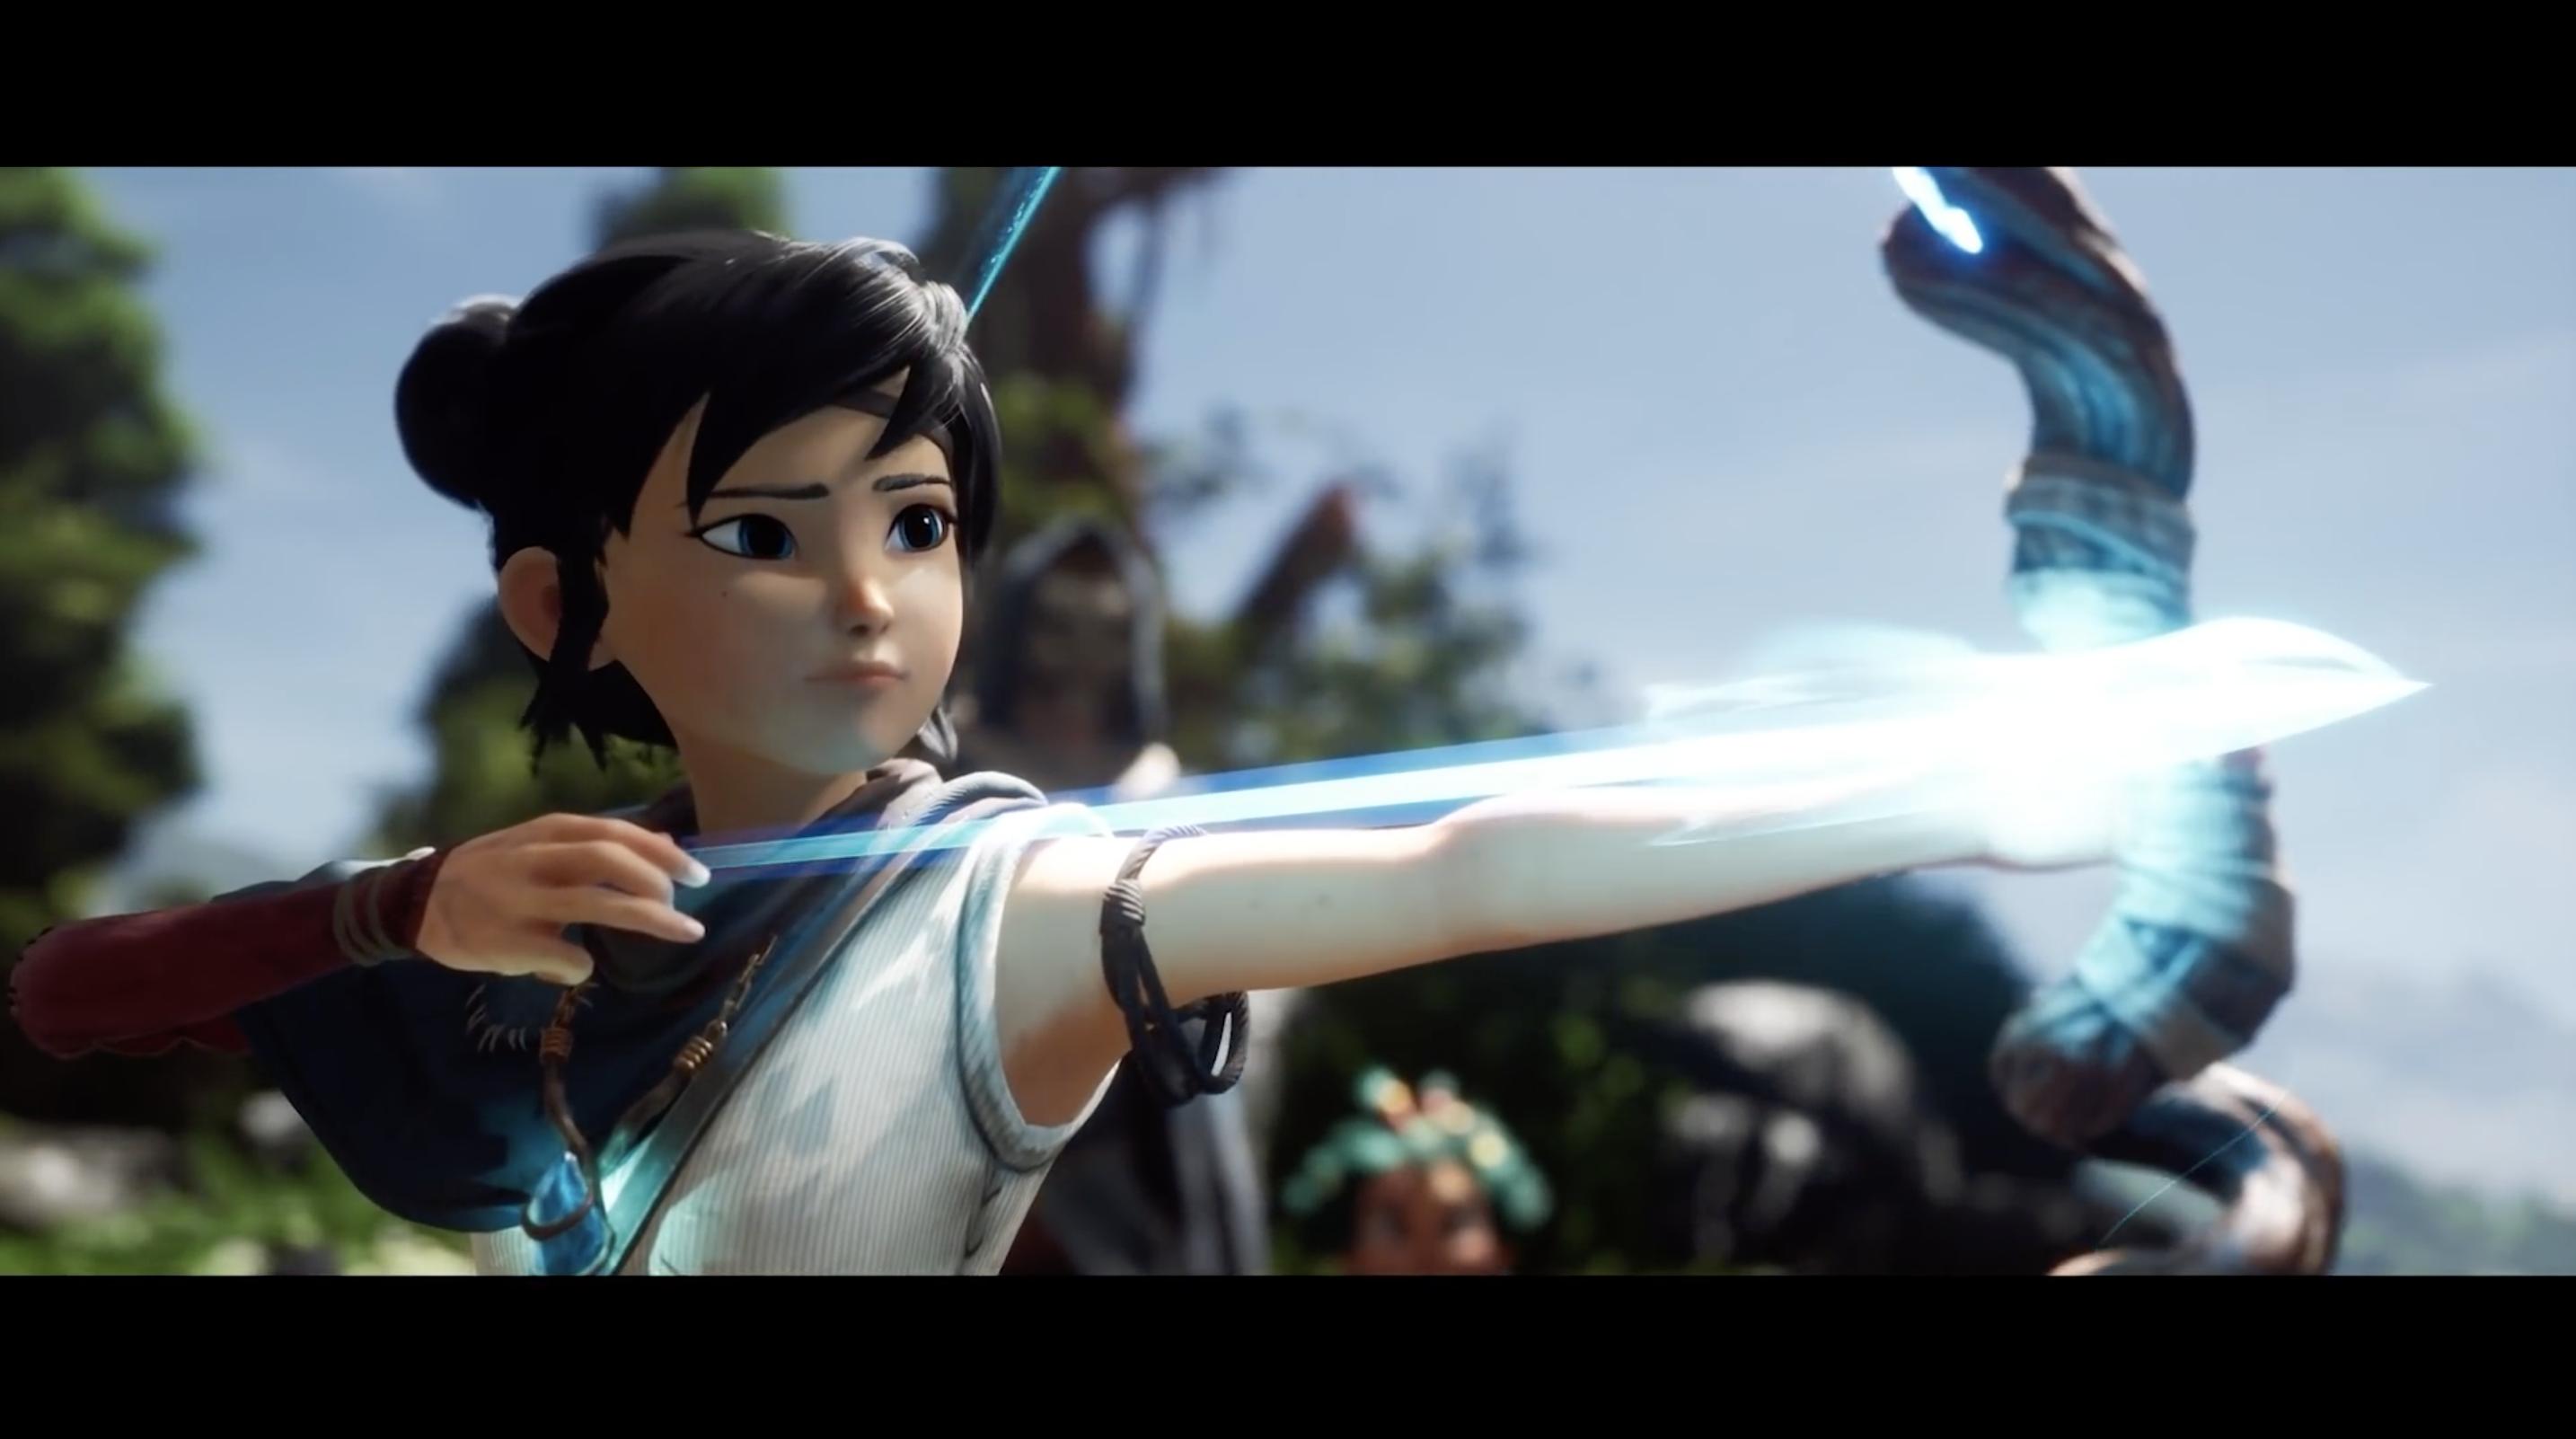 E3 2021: A Behind the Scenes Look at Kena: Bridge of Spirits